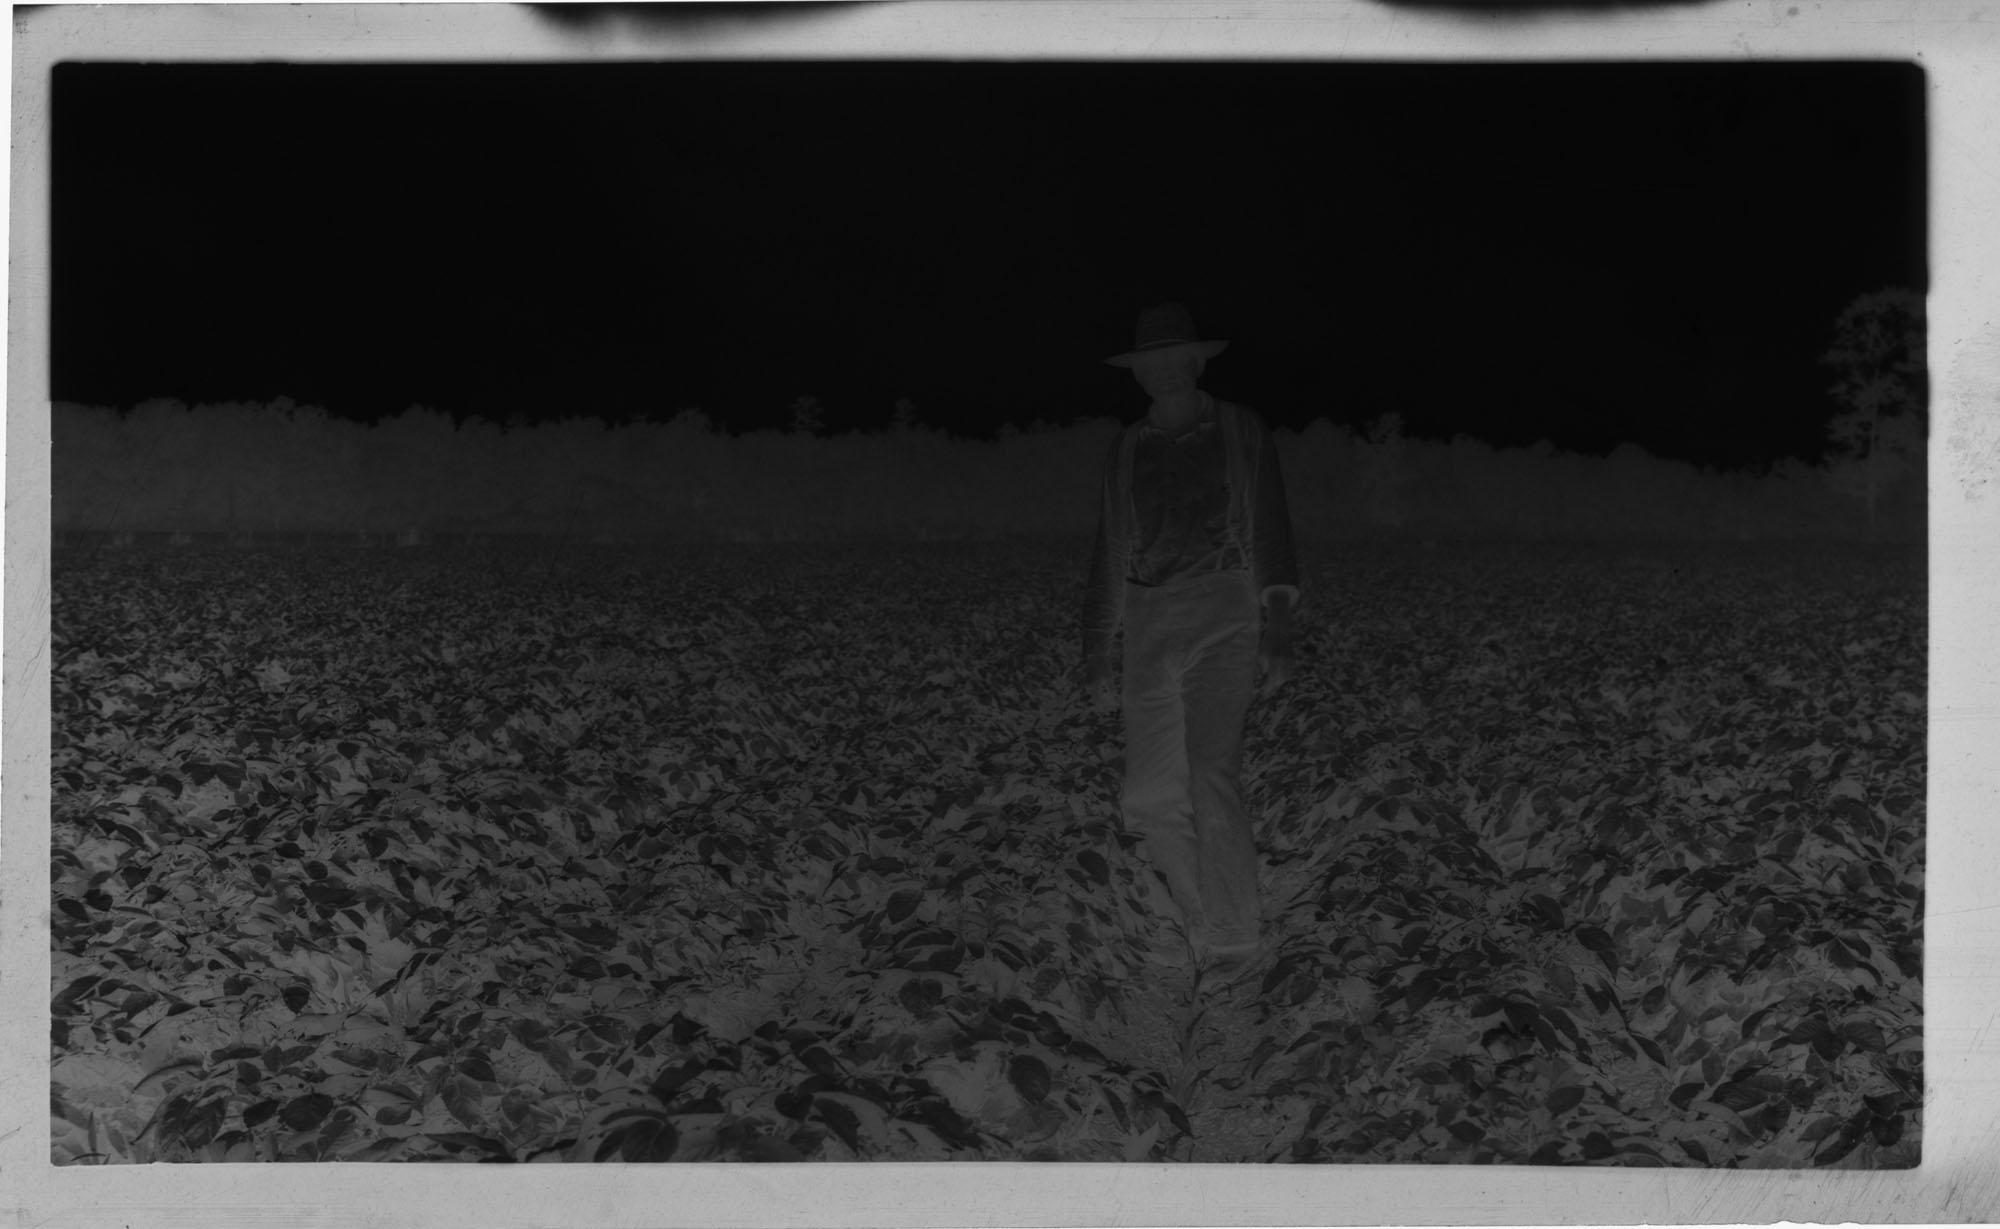 Negative of Man Standing in Field